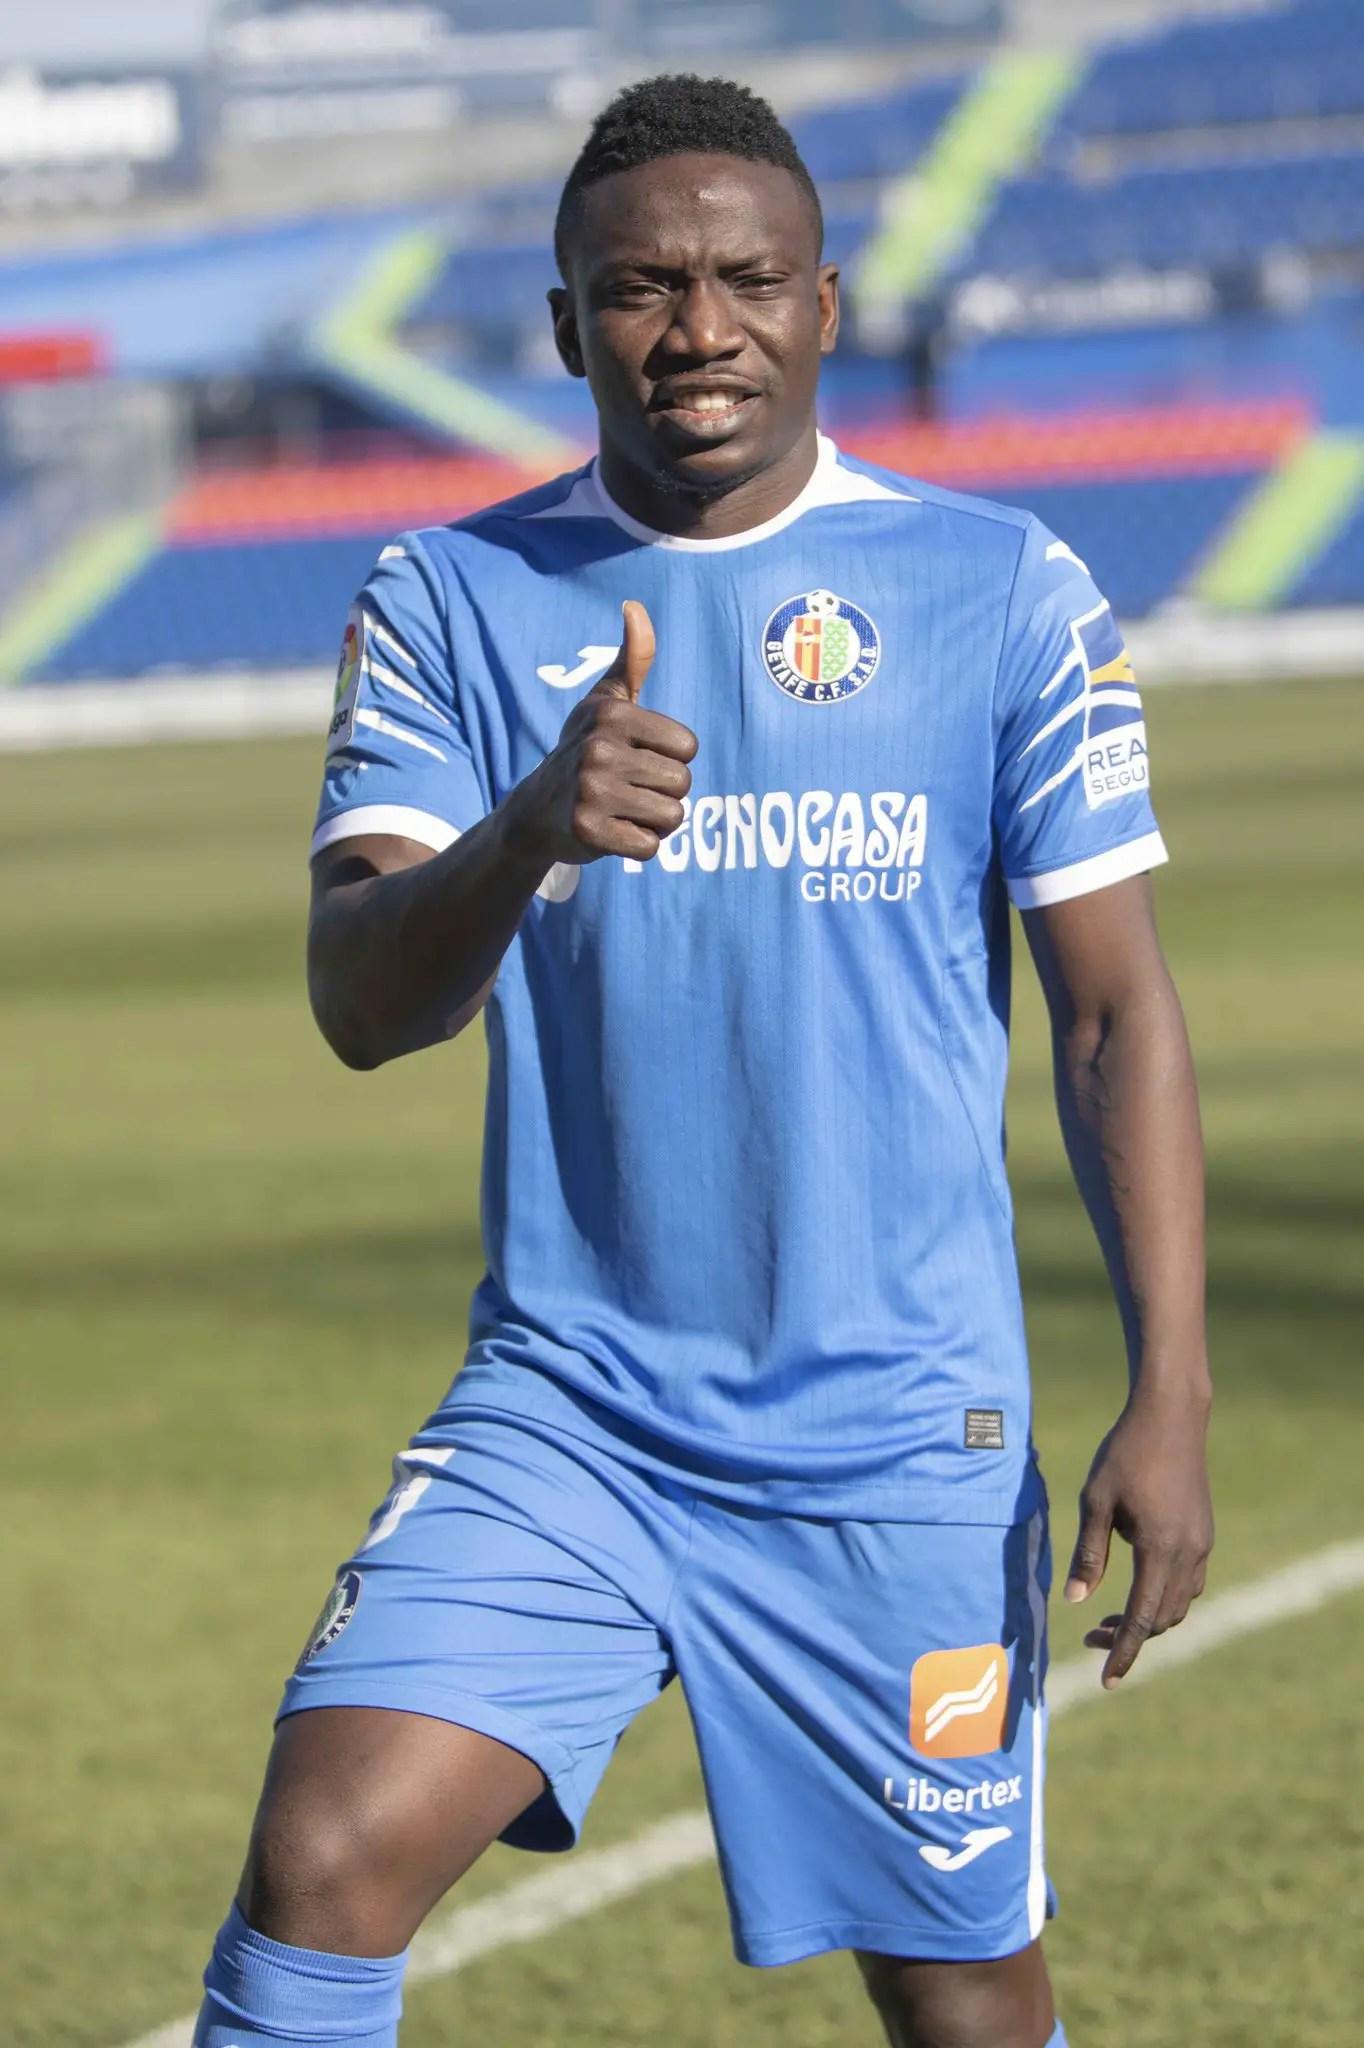 Eagles Roundup: Etebo Makes Losing Debut With  Getafe ; Chukwueze, Azeez Win With Villareal, Granada